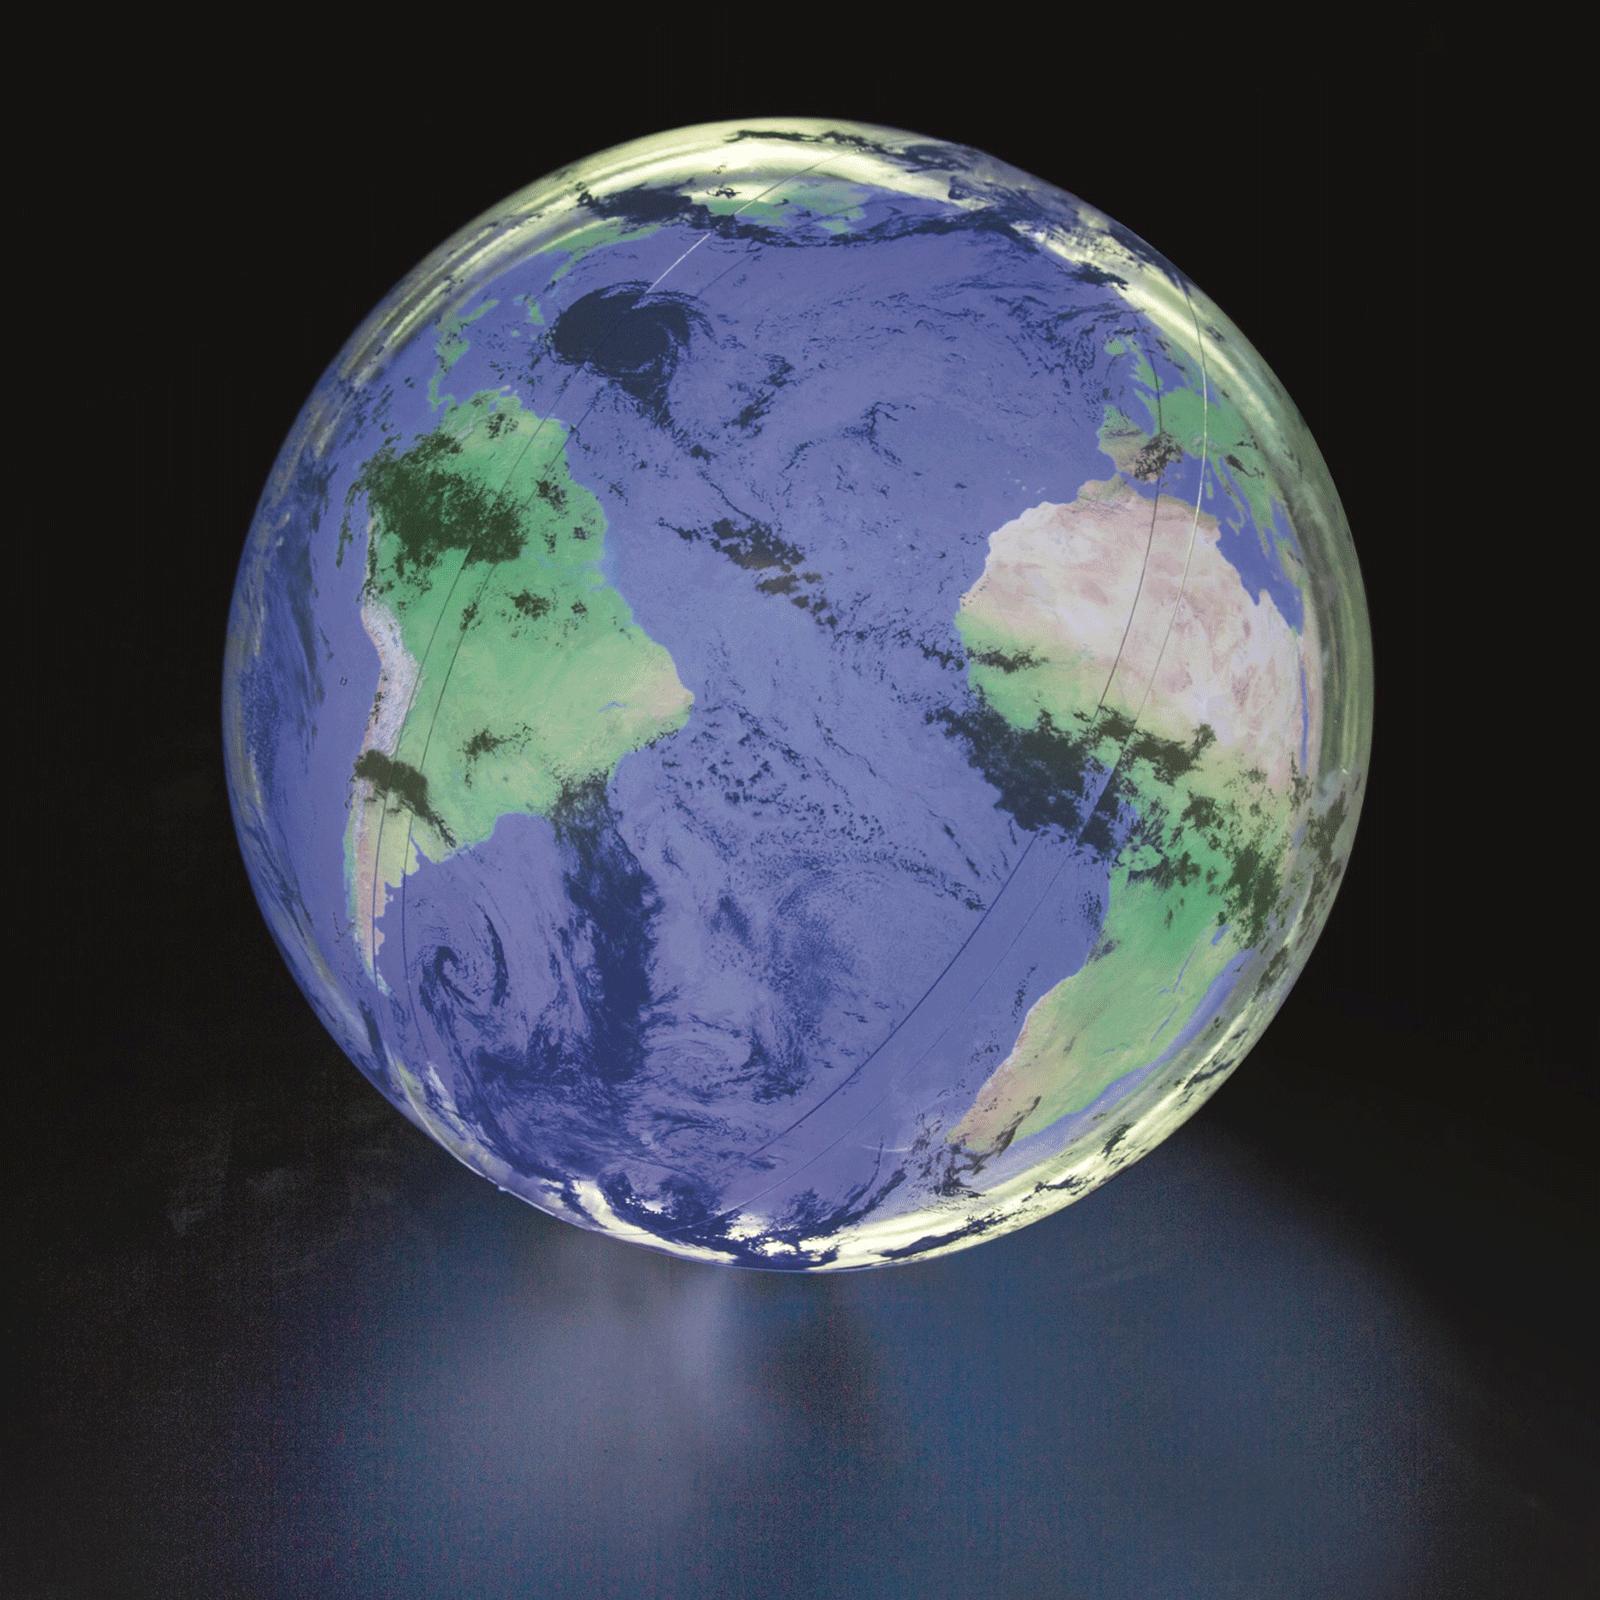 Opblaasbare bal 'World' met licht